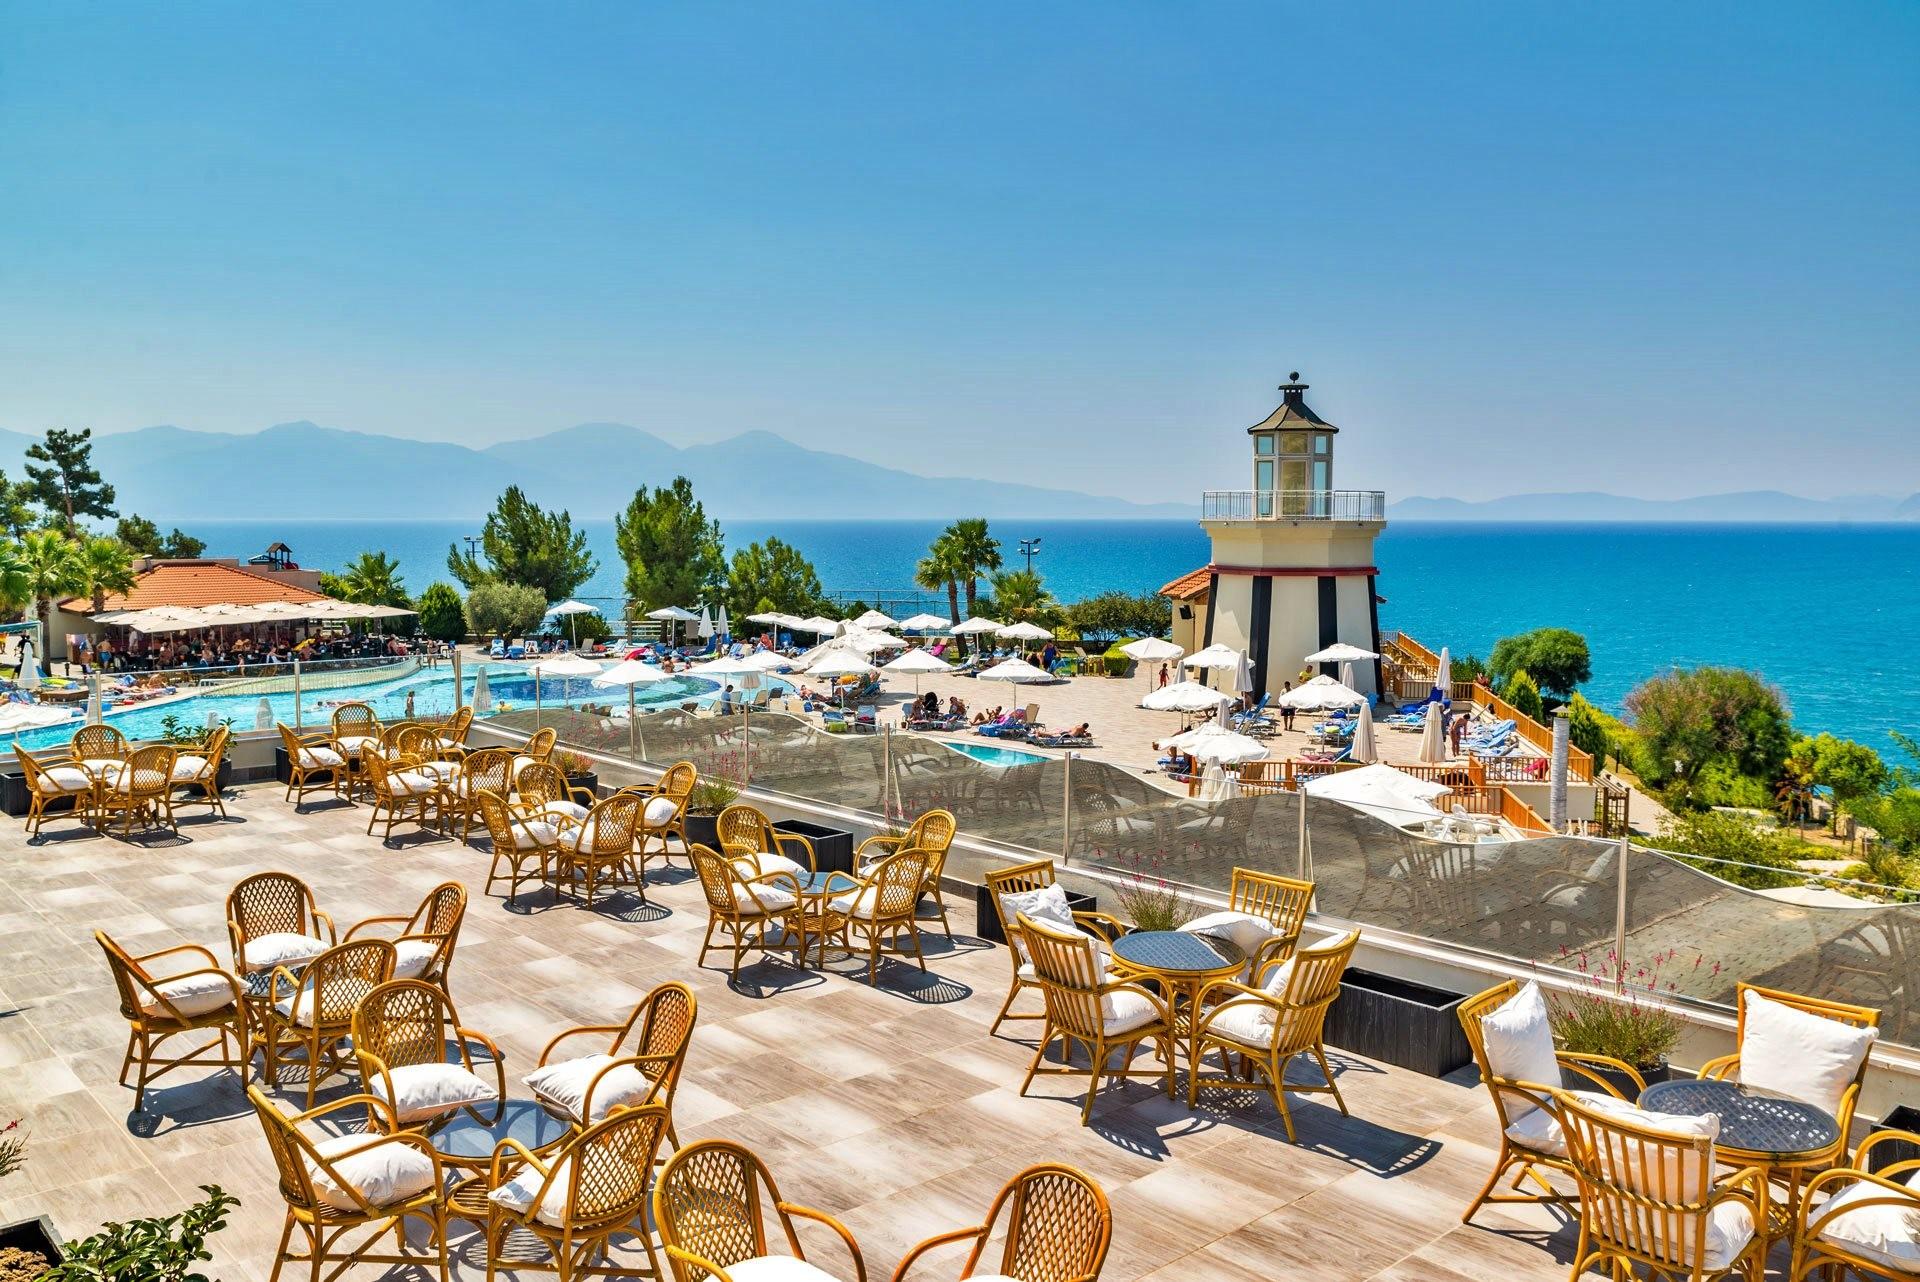 Sealight Resort Hotel - ресторант тераса